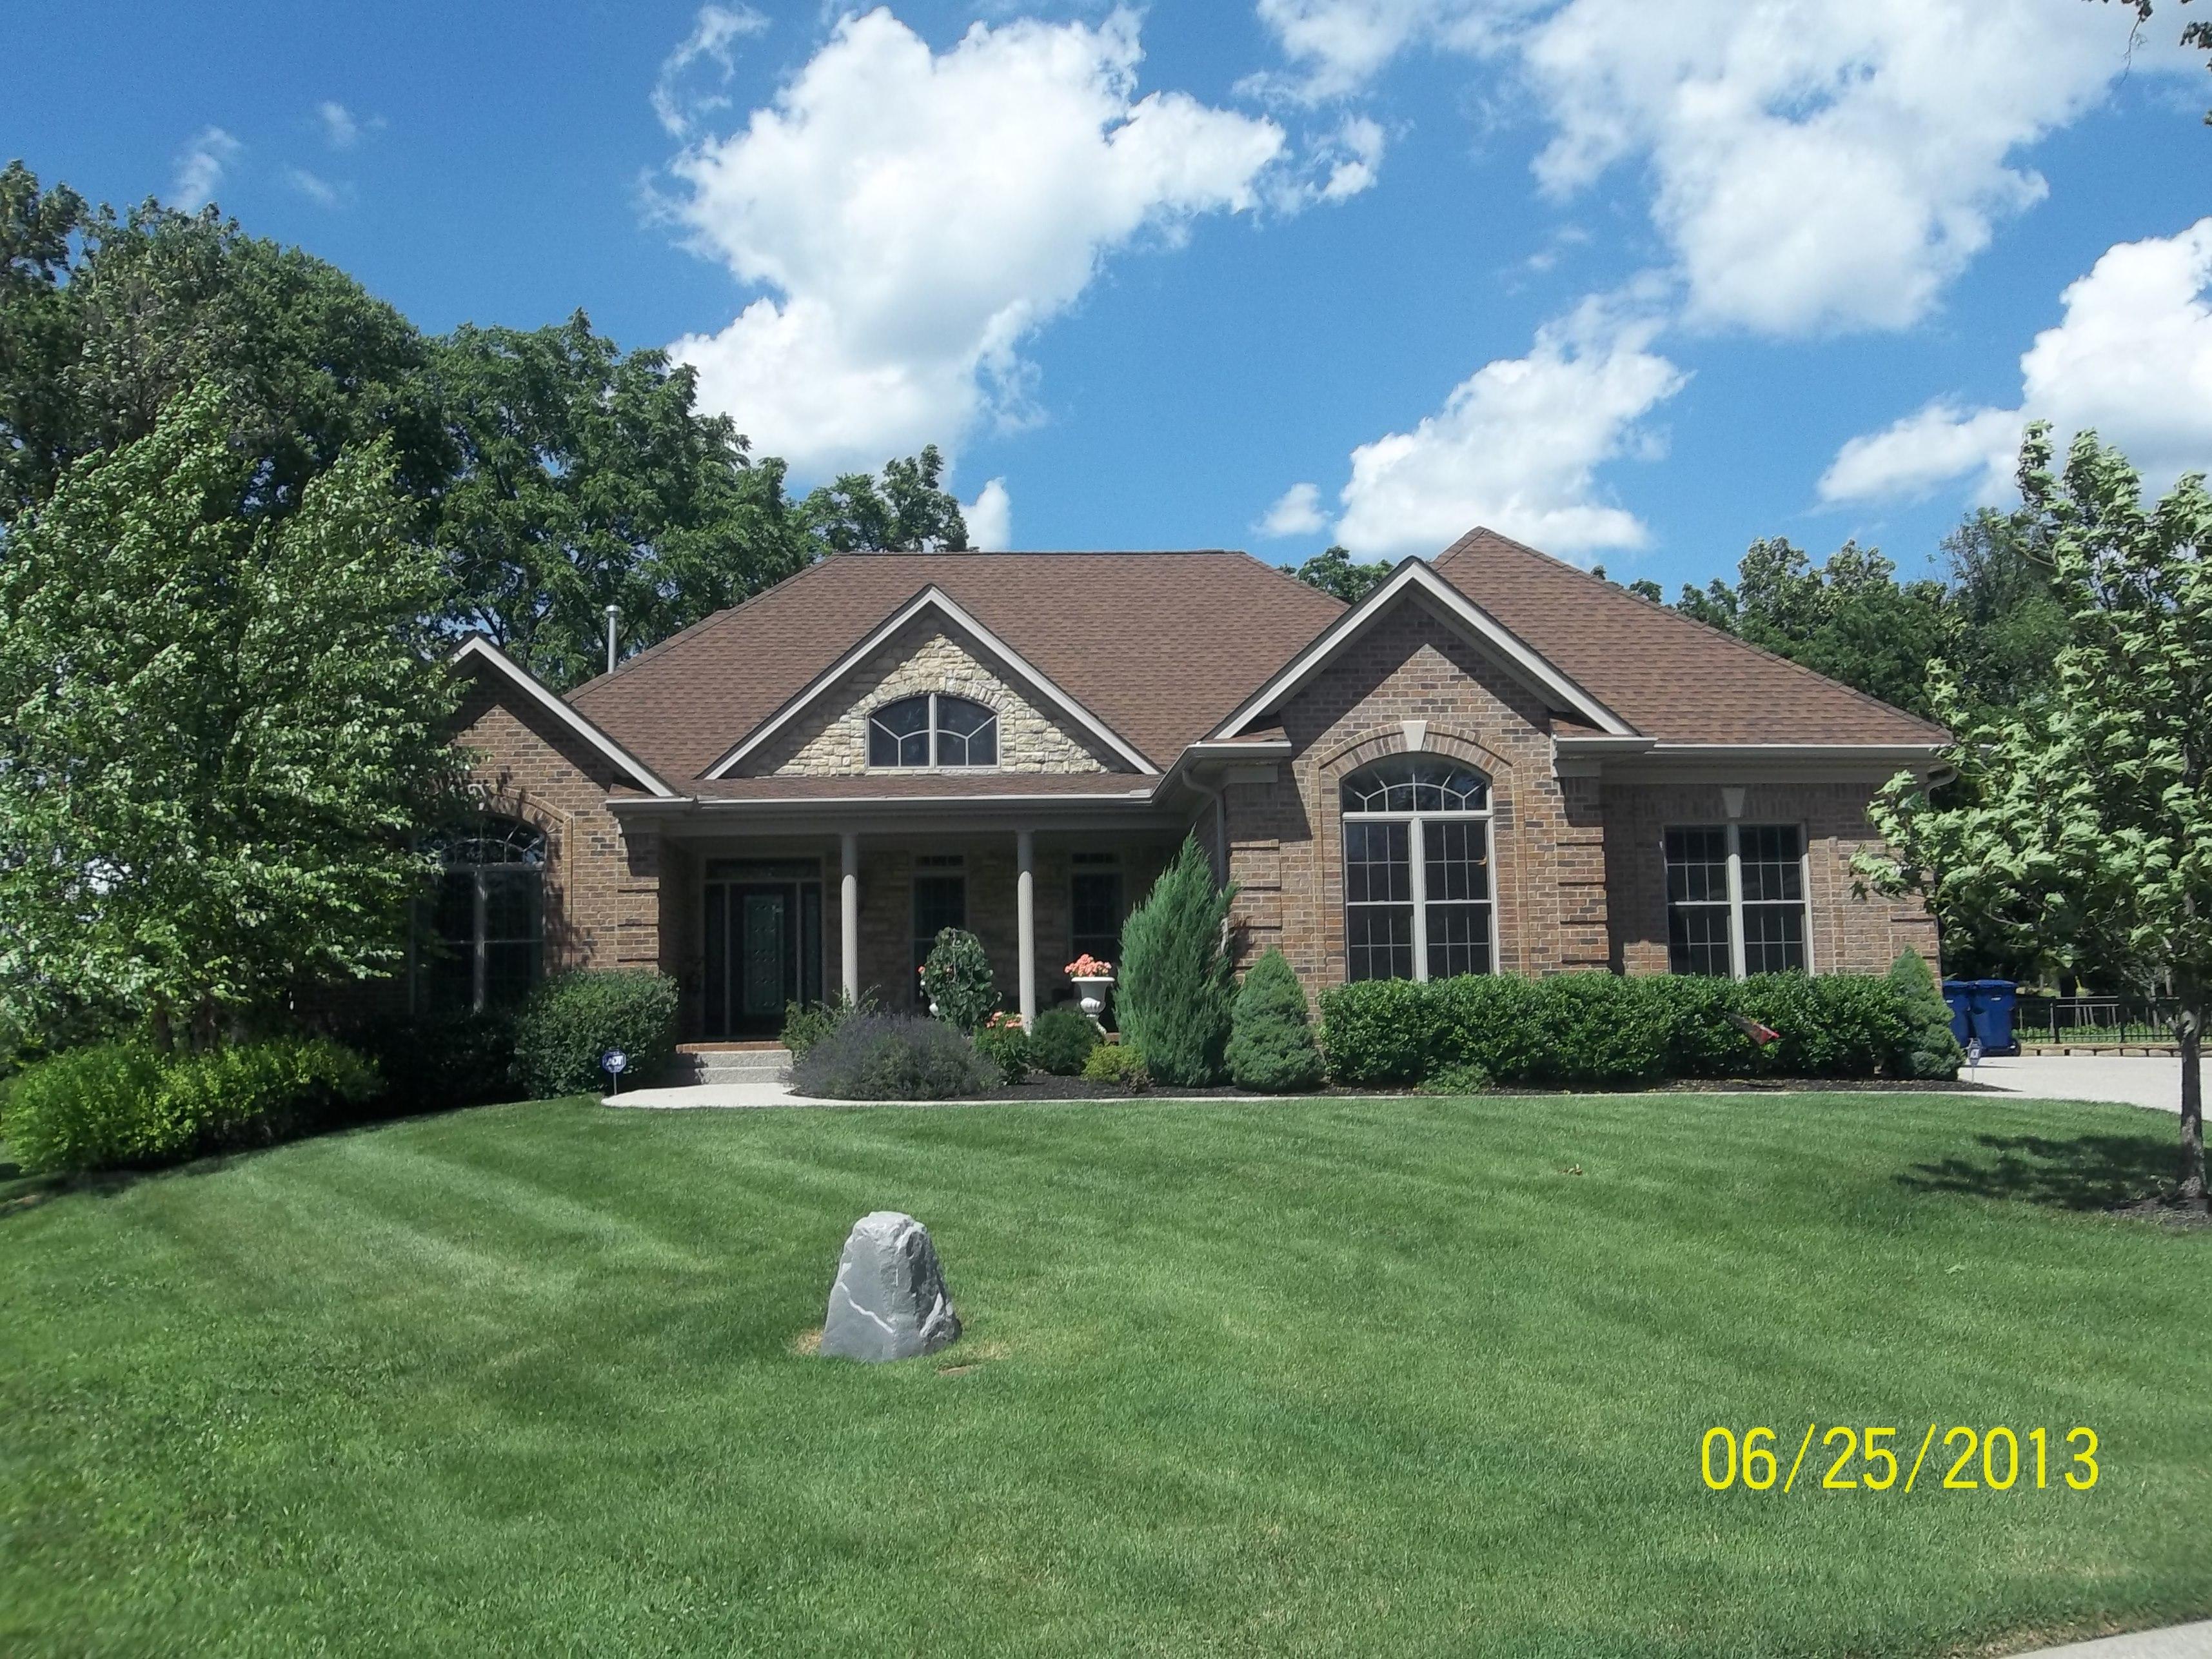 7205 Star Barn, Crestwood, Kentucky 40014